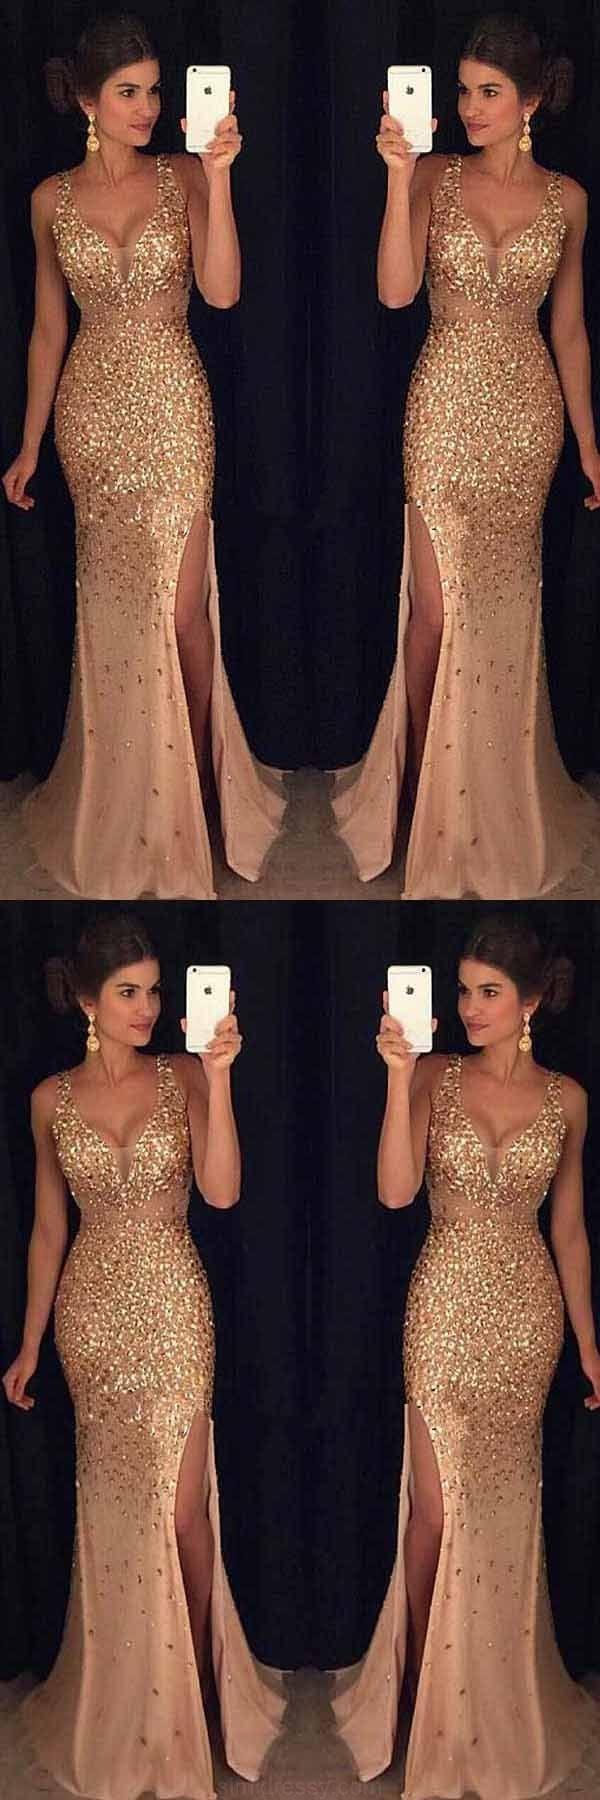 Lacepromdresses simple prom dresses lace prom dresses